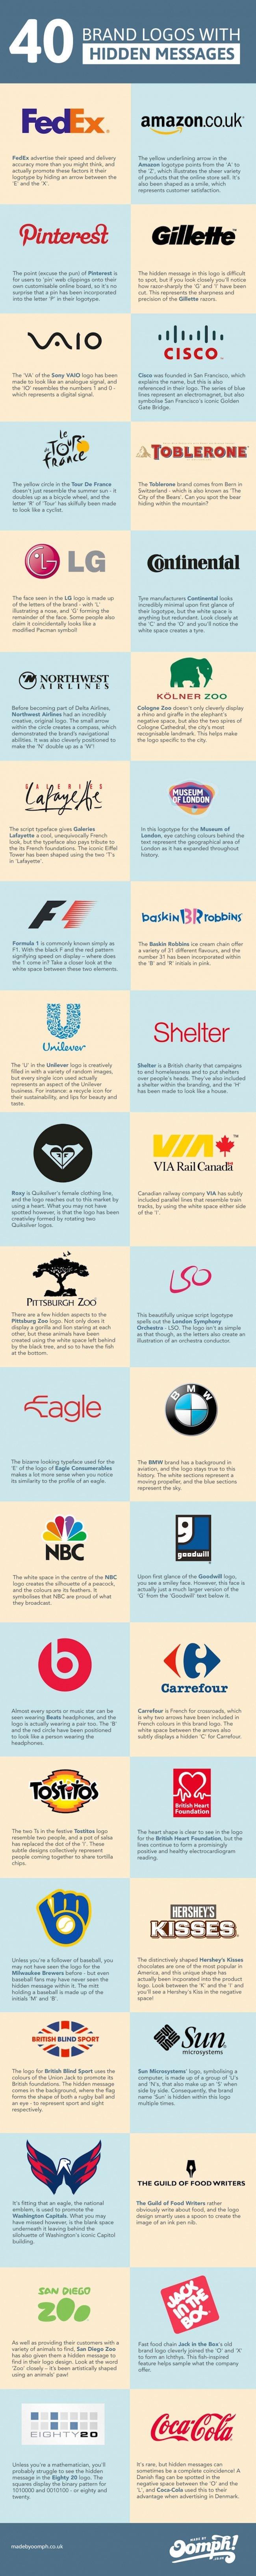 brand-logos-with-hidden-messages